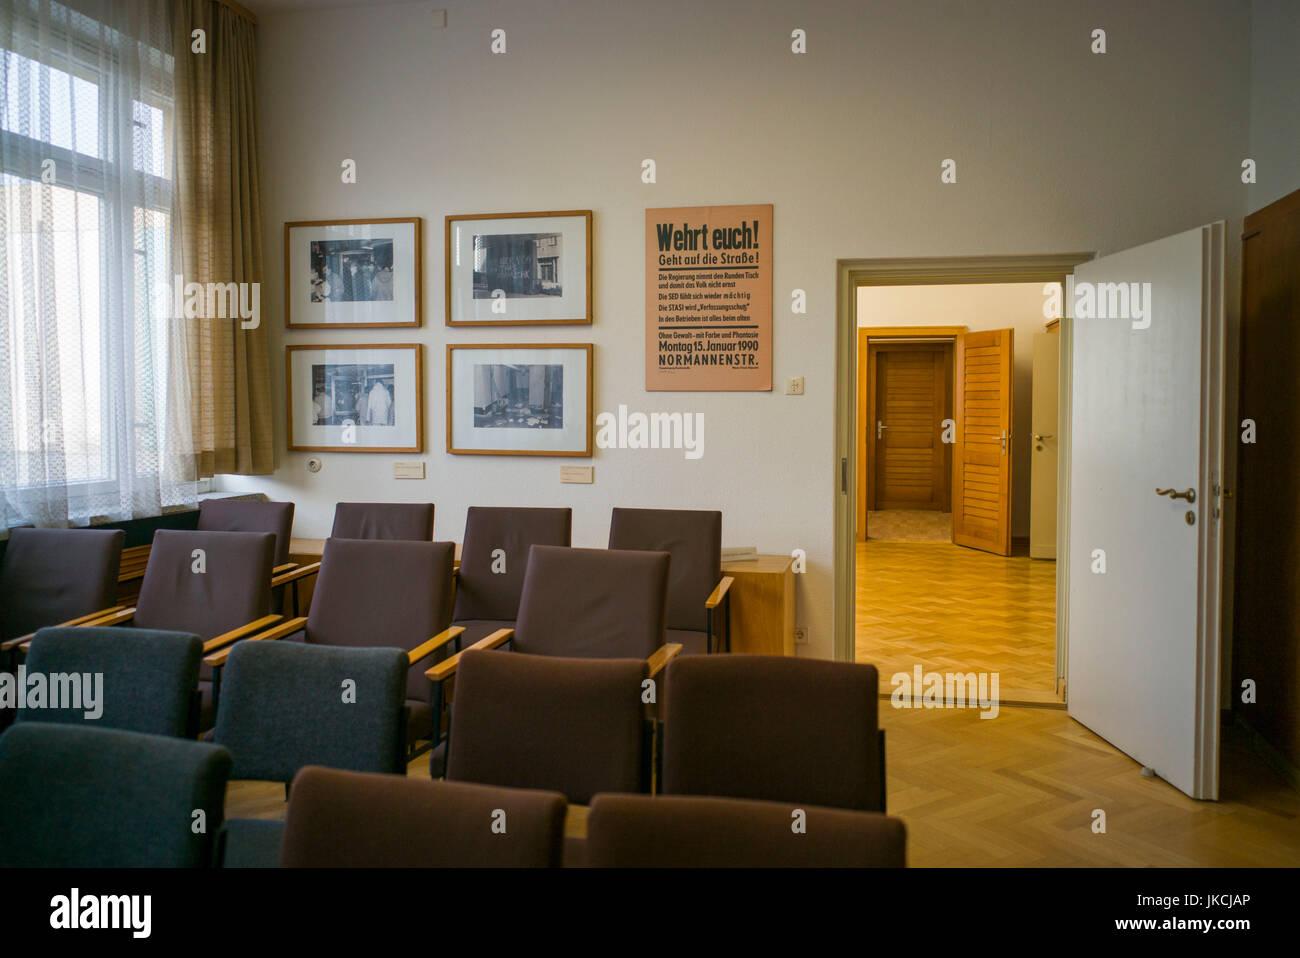 Germany, Berlin, Friendrichshain, Stasi Museum, DDR-era secret police museum in former secret police headquarters, - Stock Image